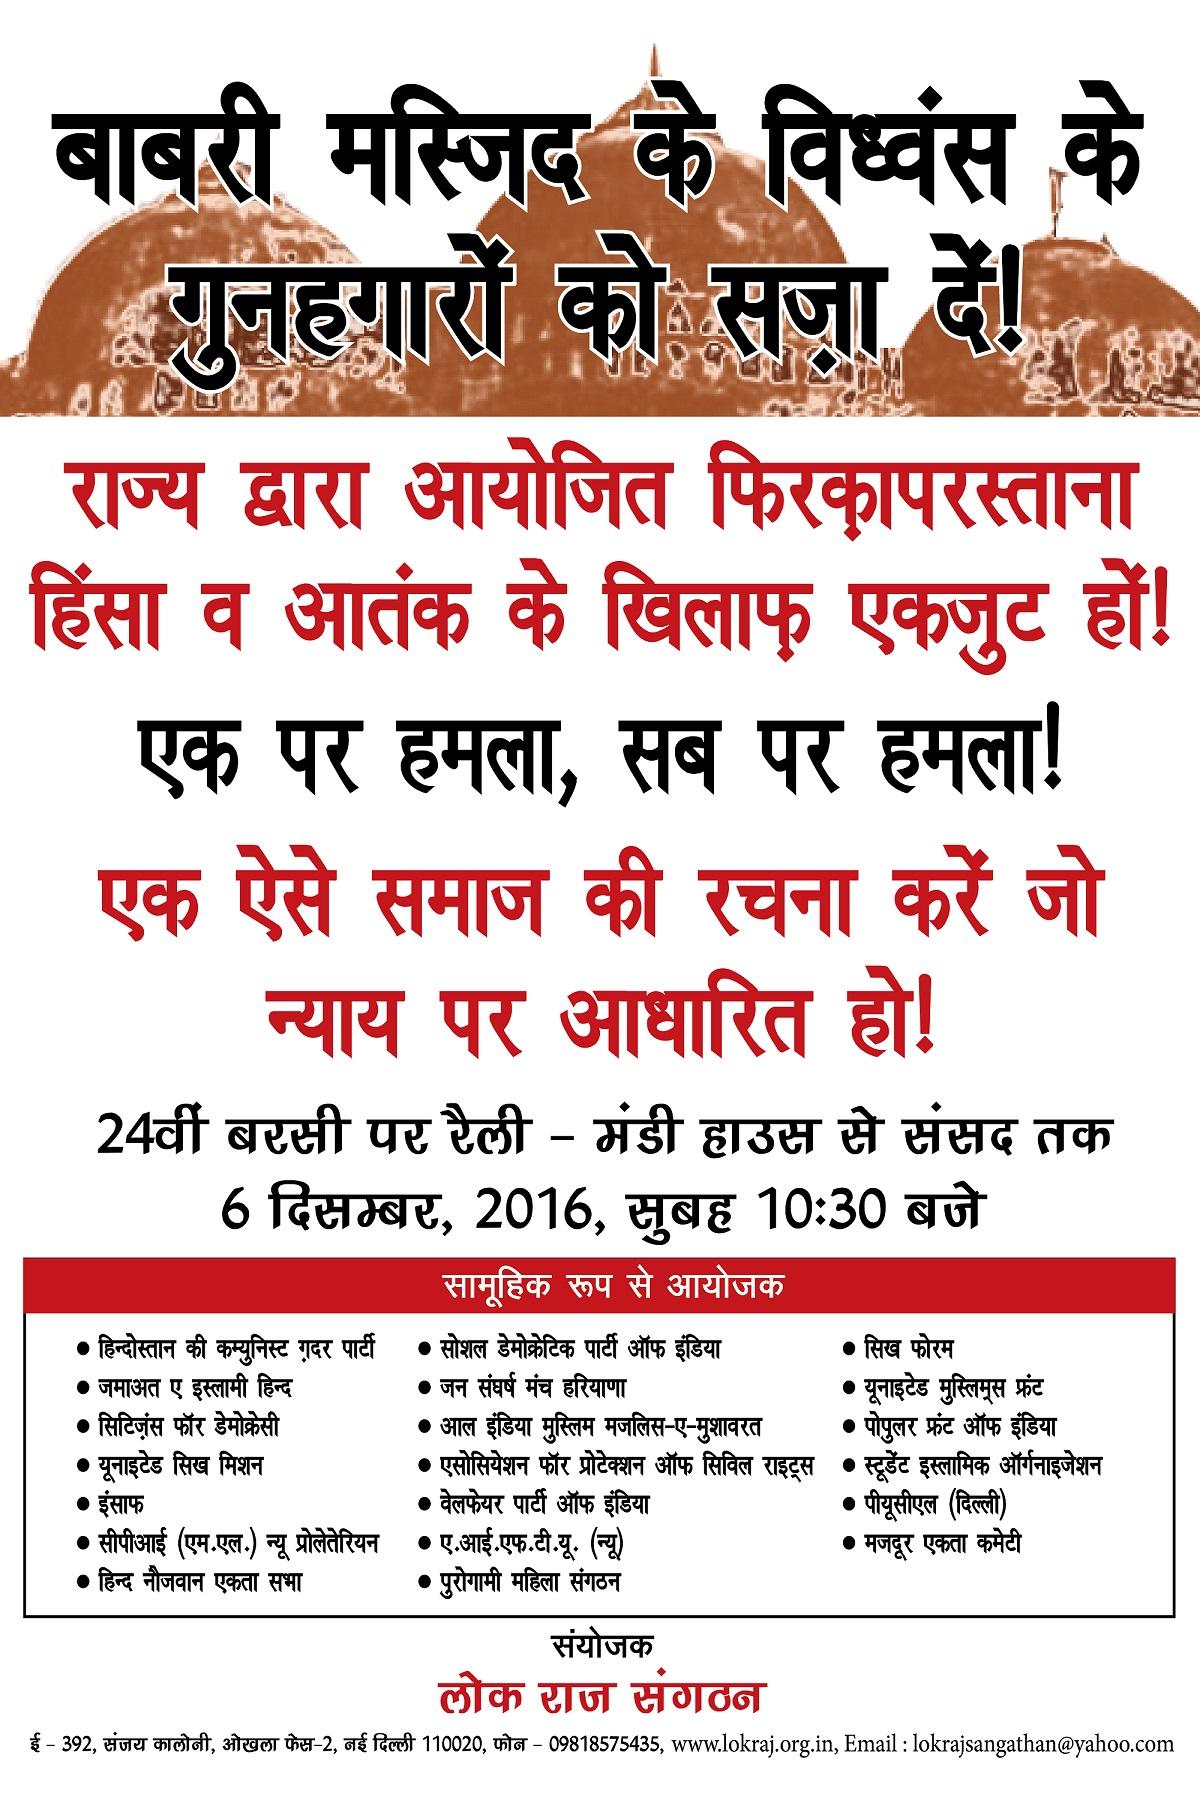 6 Dec Rally-2016-poster